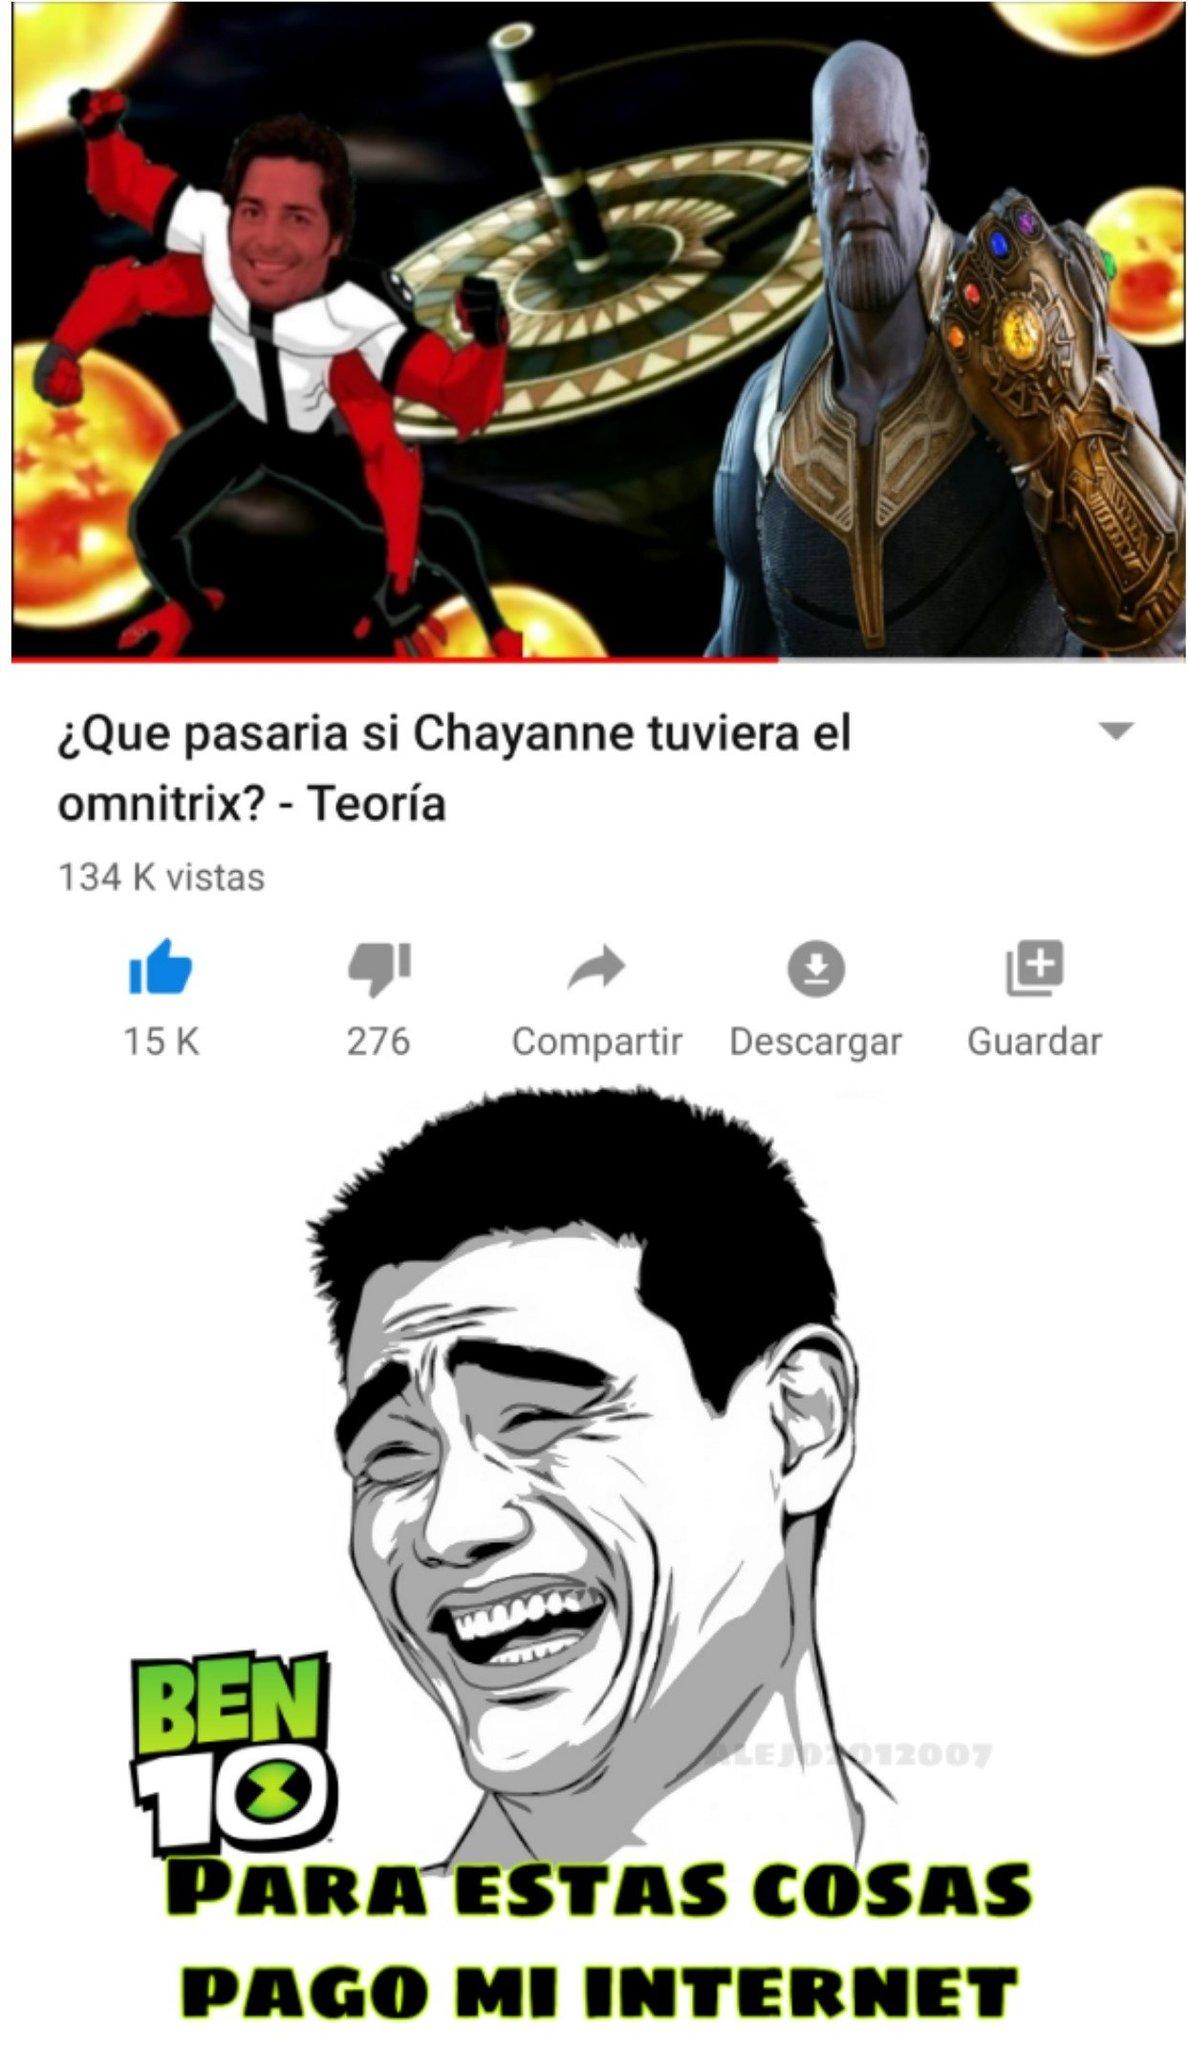 Chayanne va a salvar el mundo jajaja - meme